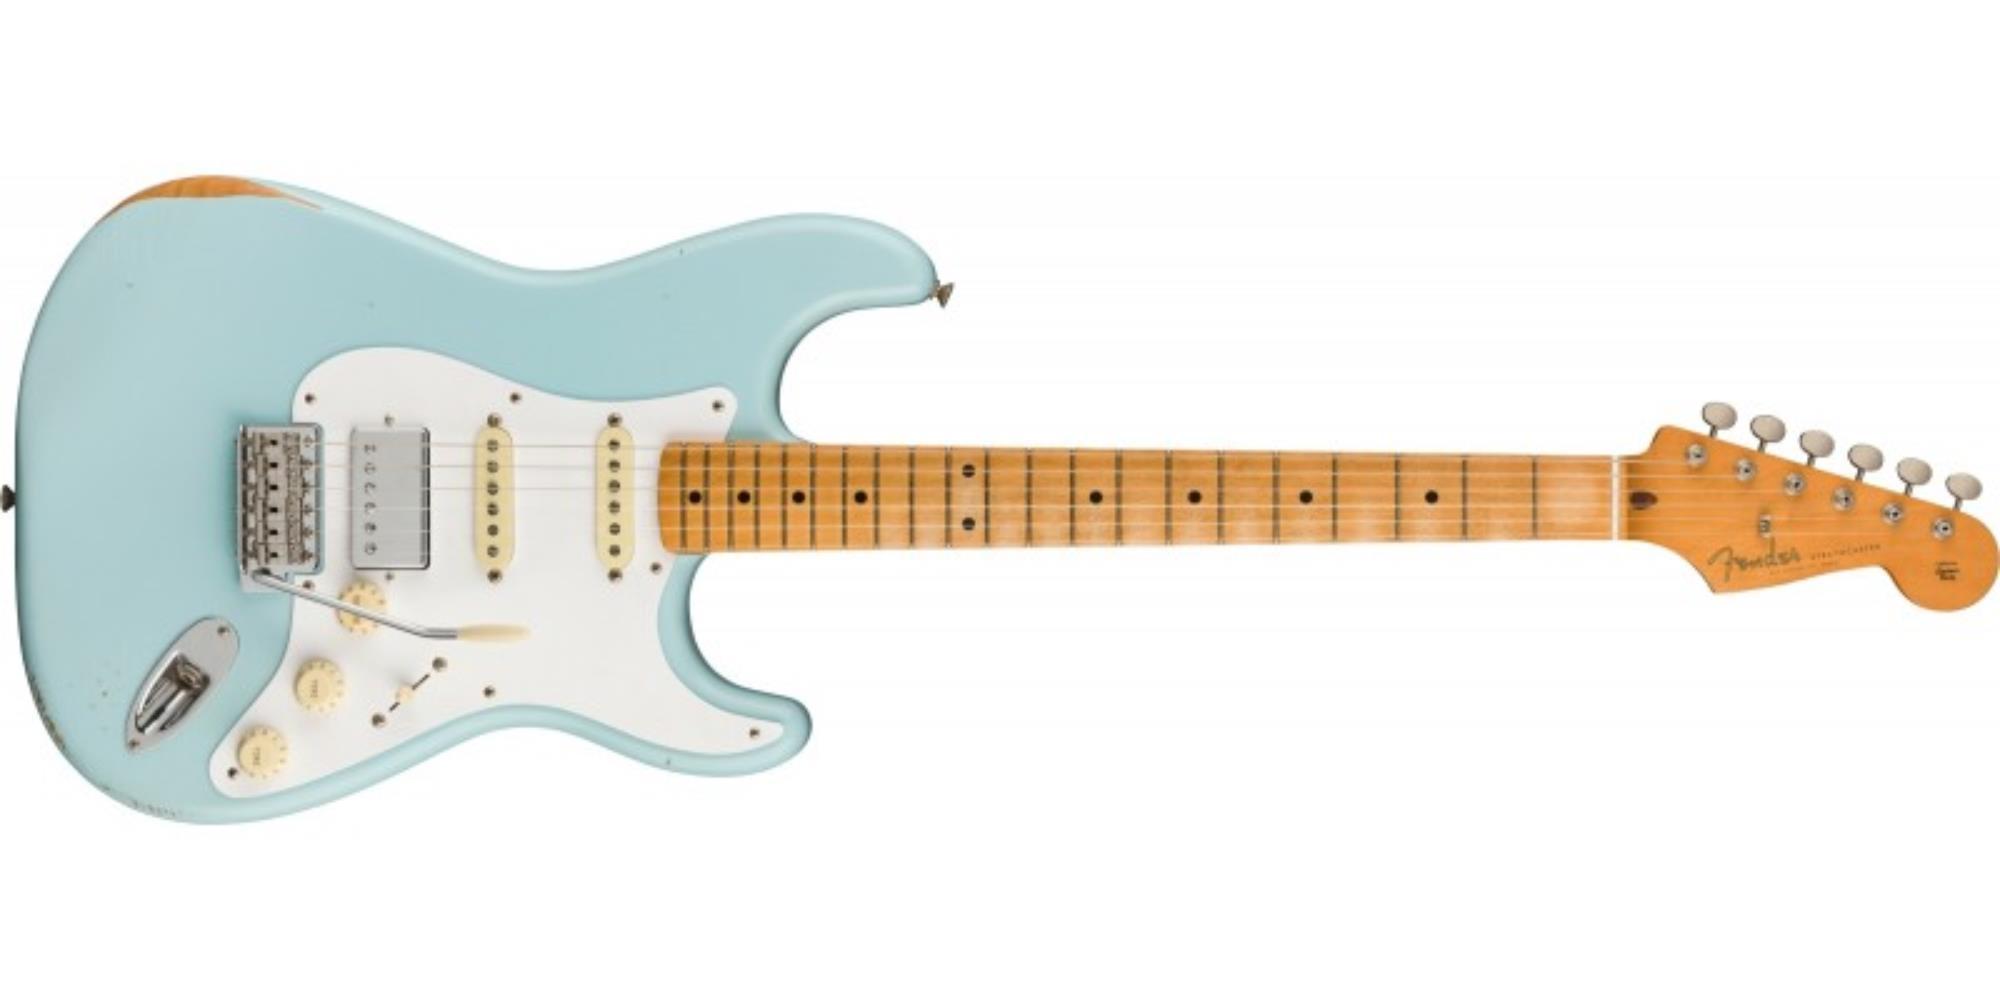 FENDER-Limited-Edition-Vintera-Road-Worn-50s-Stratocaster-HSS-Sonic-Blue-0149972372-sku-24808